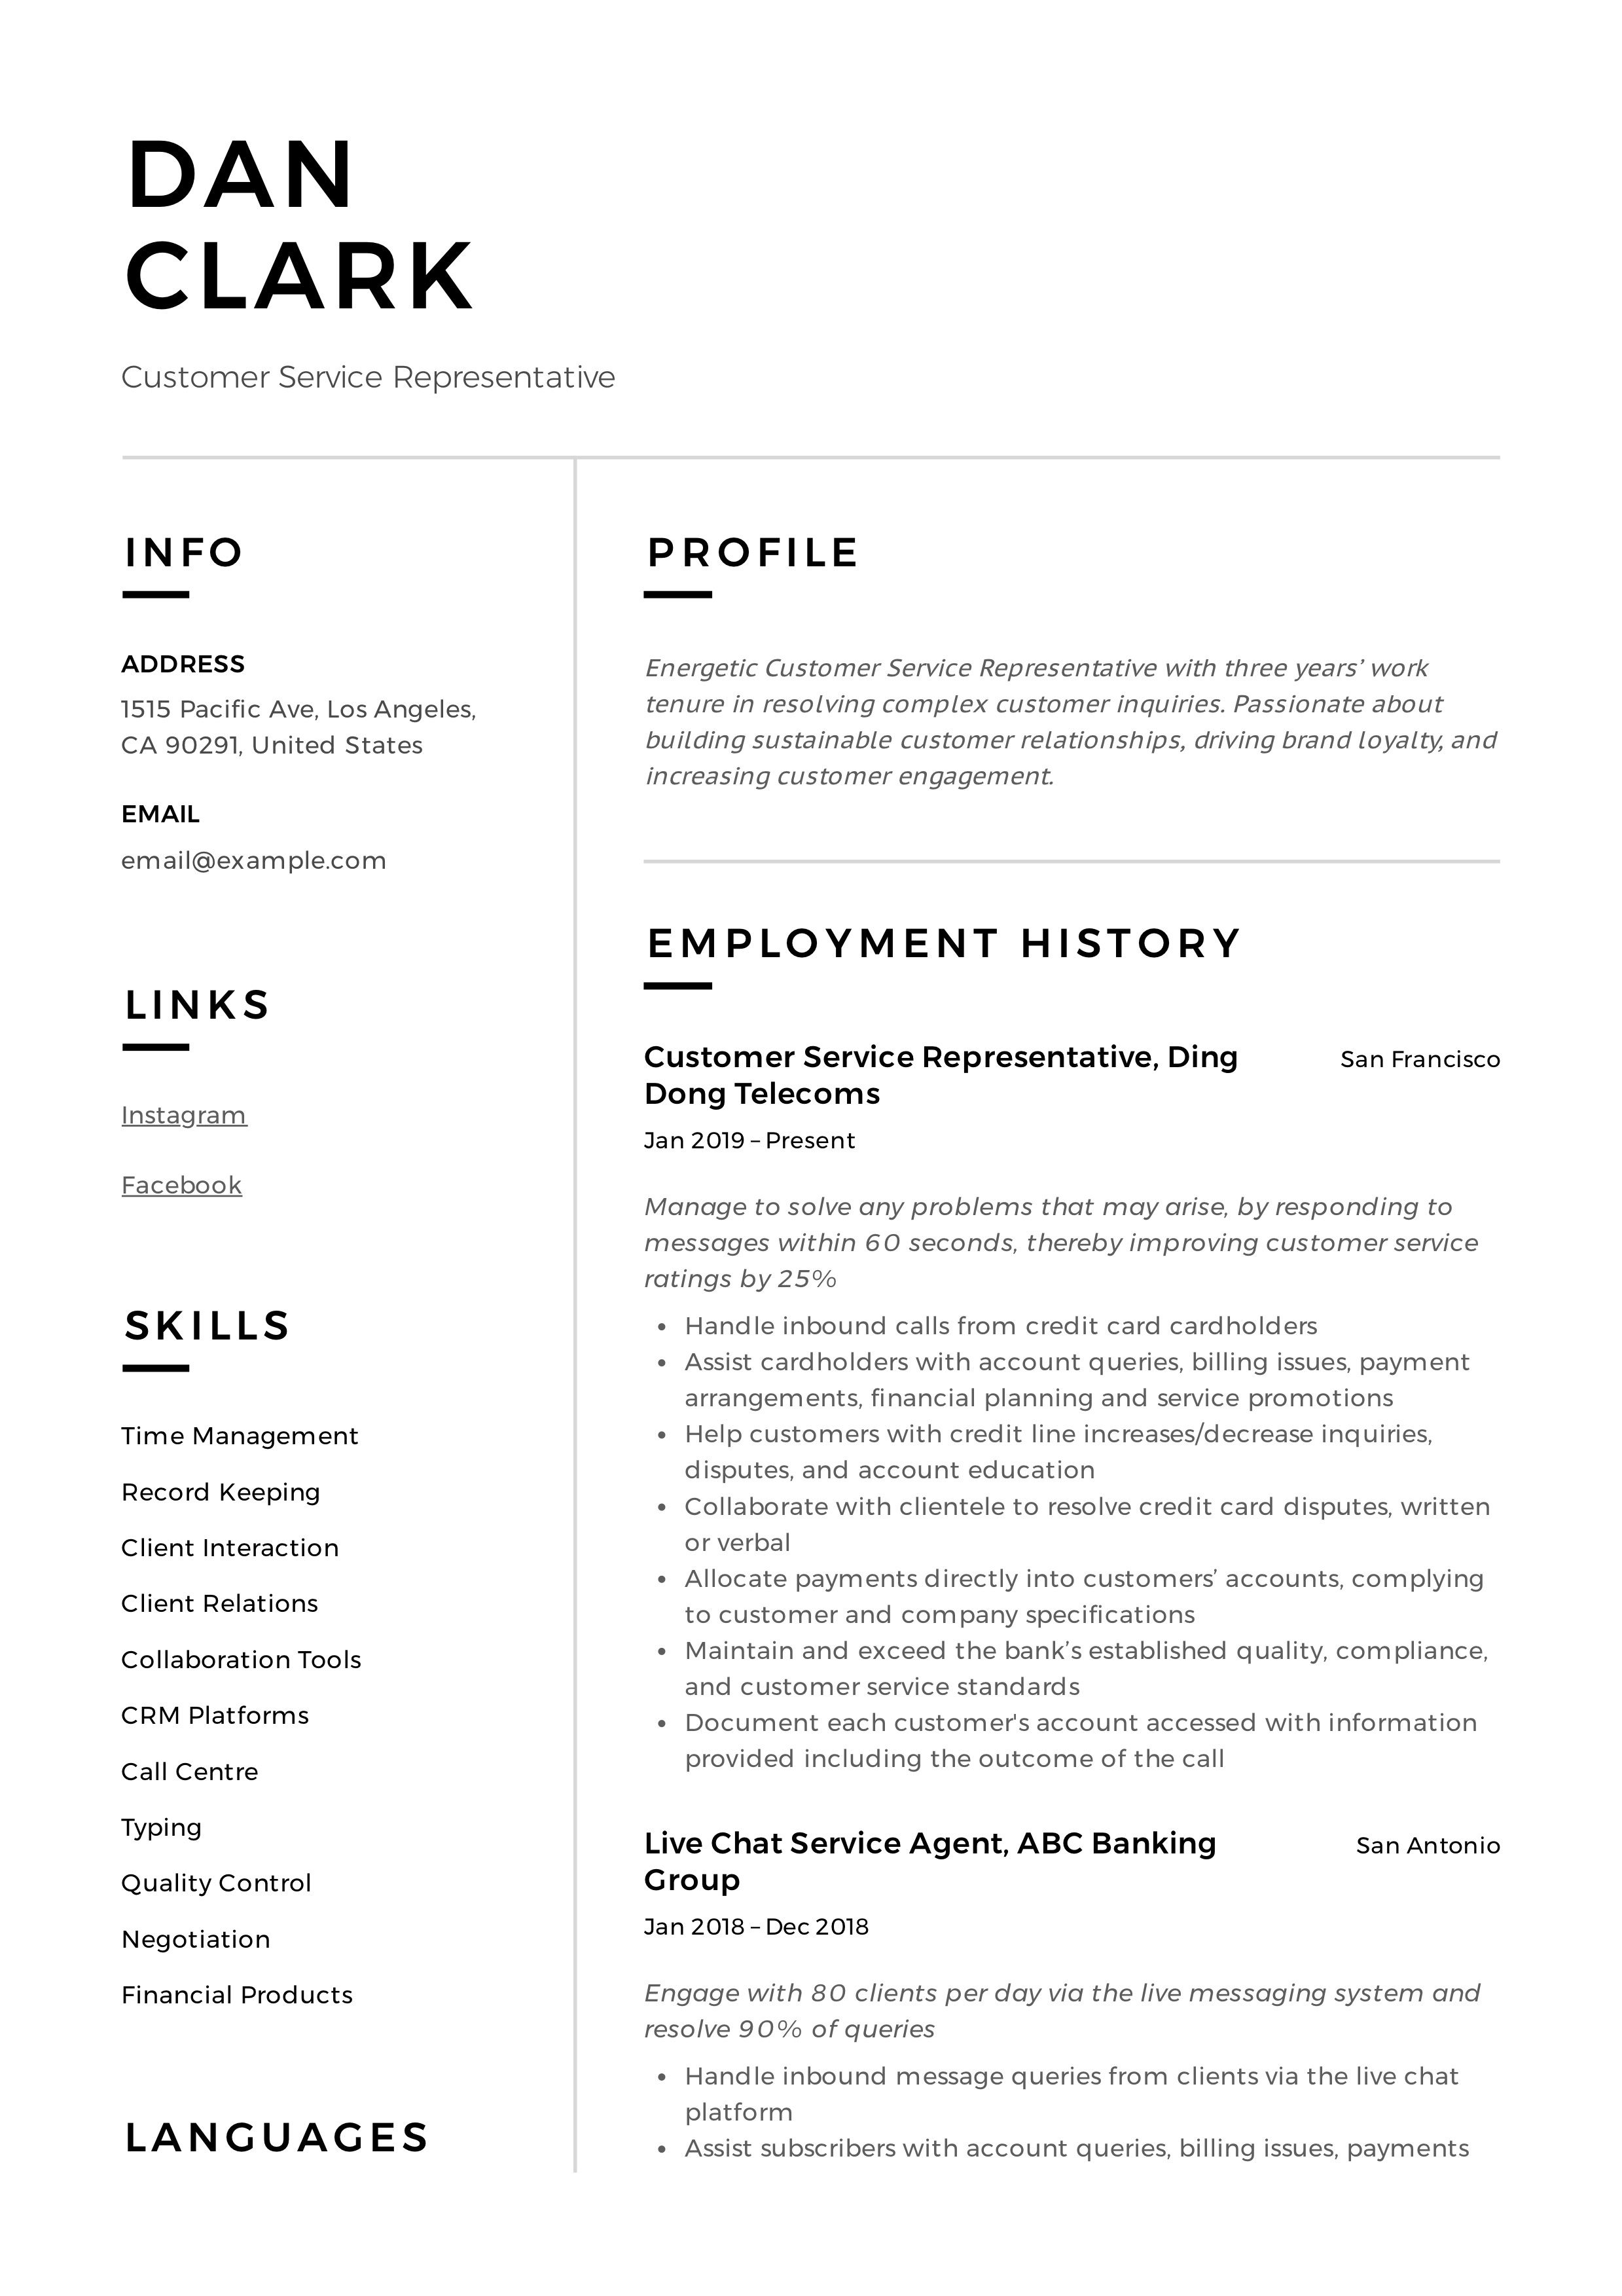 Customer Service Representative Resume Sample Customer Service Resume Examples Resume Writing Services Resume Skills